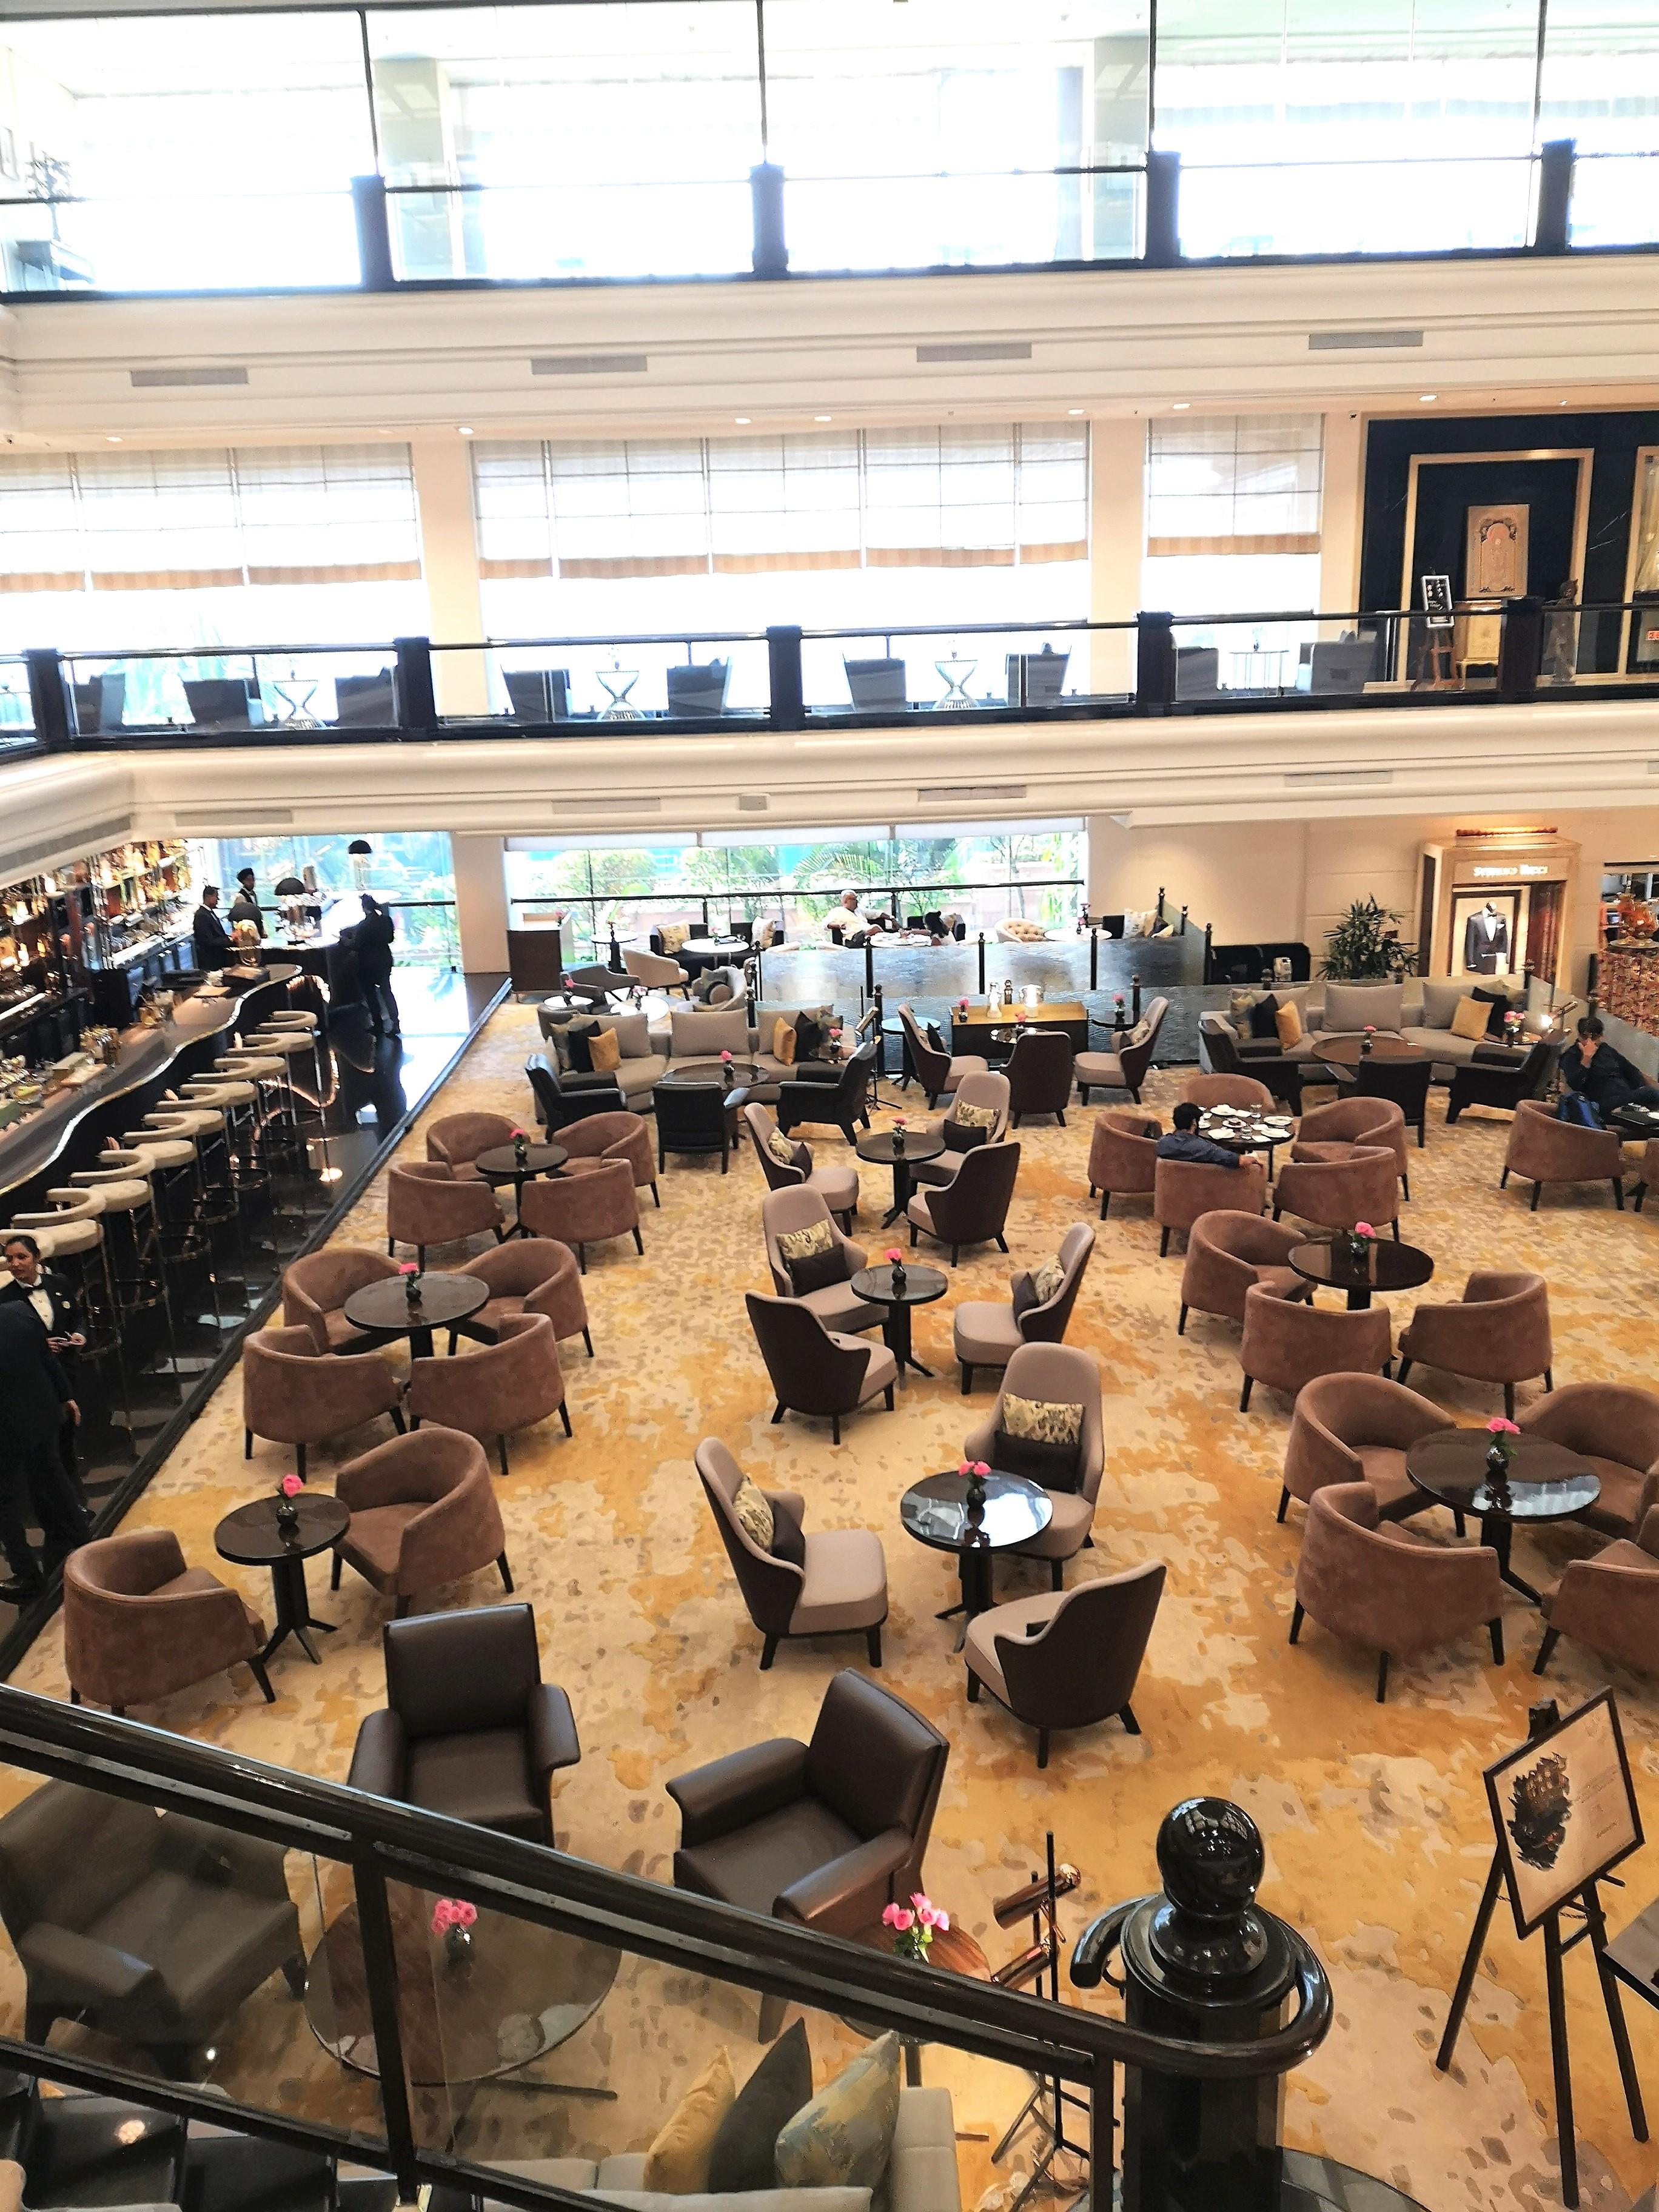 FREE IMAGES LOUNGE COFFEE SHOP PATTERNS HOTEL BANDRA MUMBAI